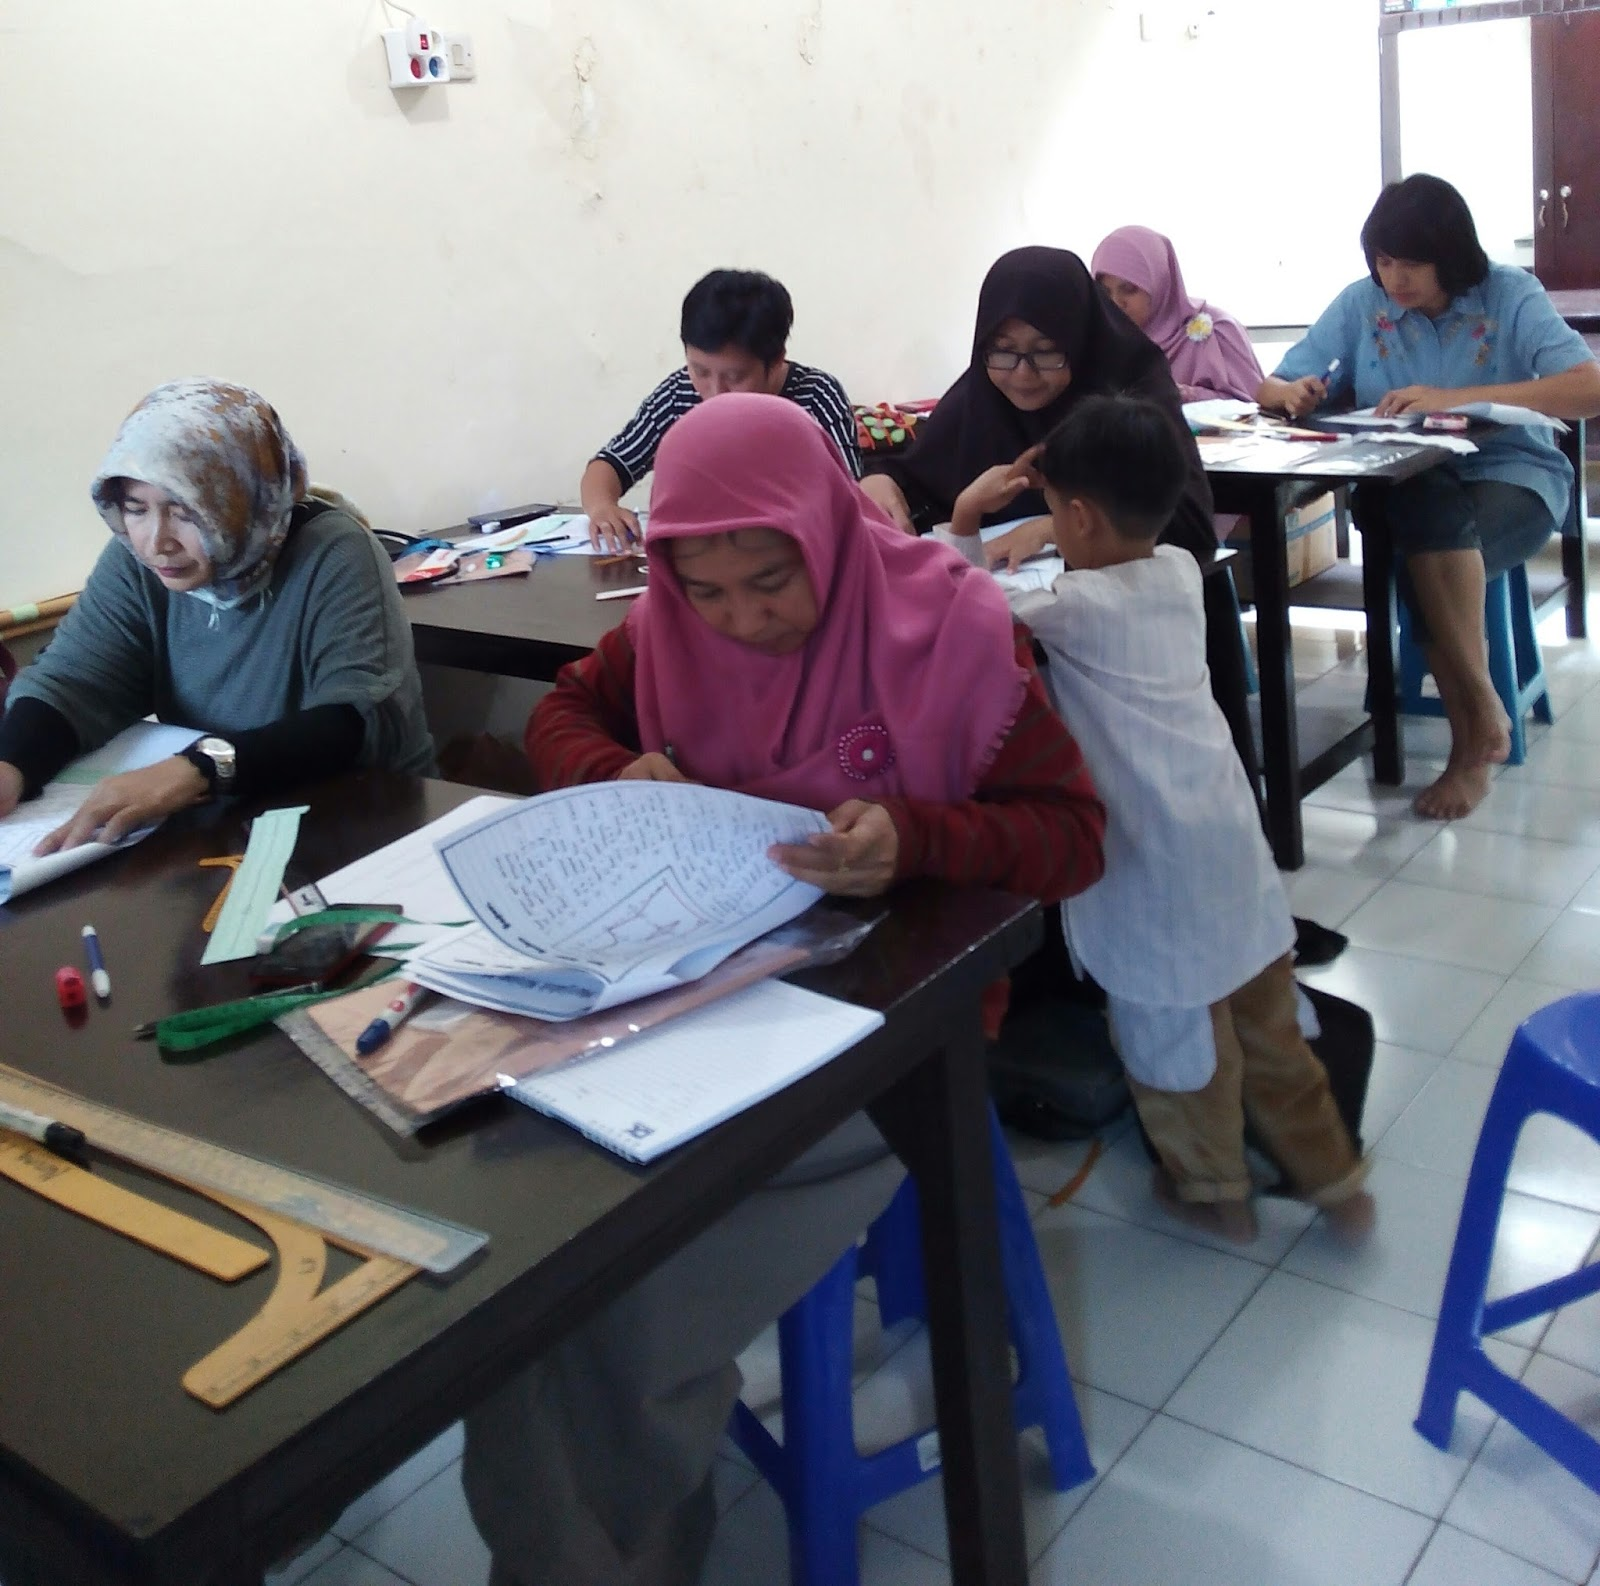 Pelatihan Kursus Menjahit Di Depok Buku Panduan Dalam Pelajaran